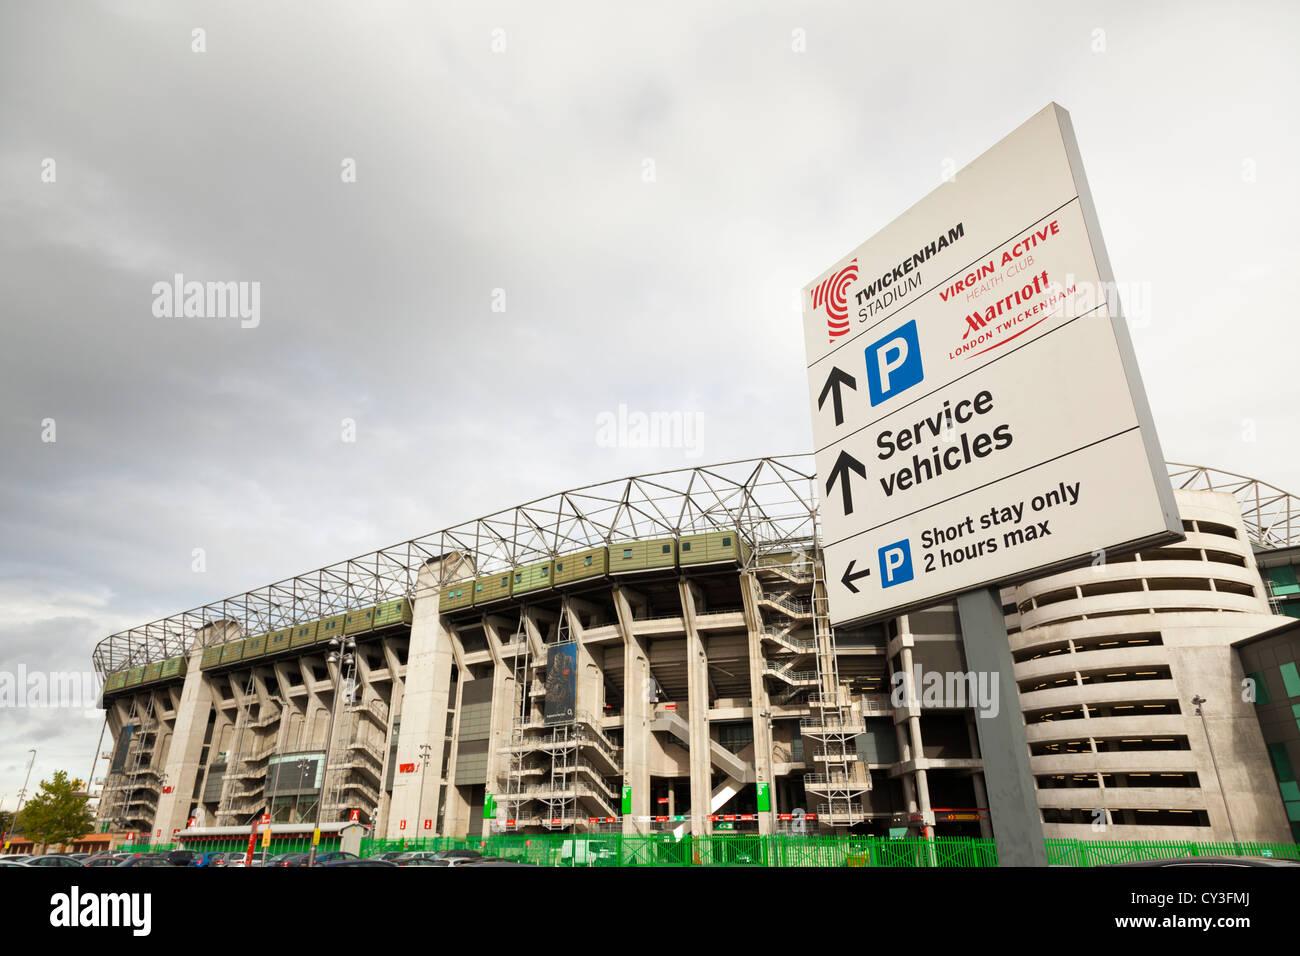 Twickenham stadium with parking information sign. - Stock Image